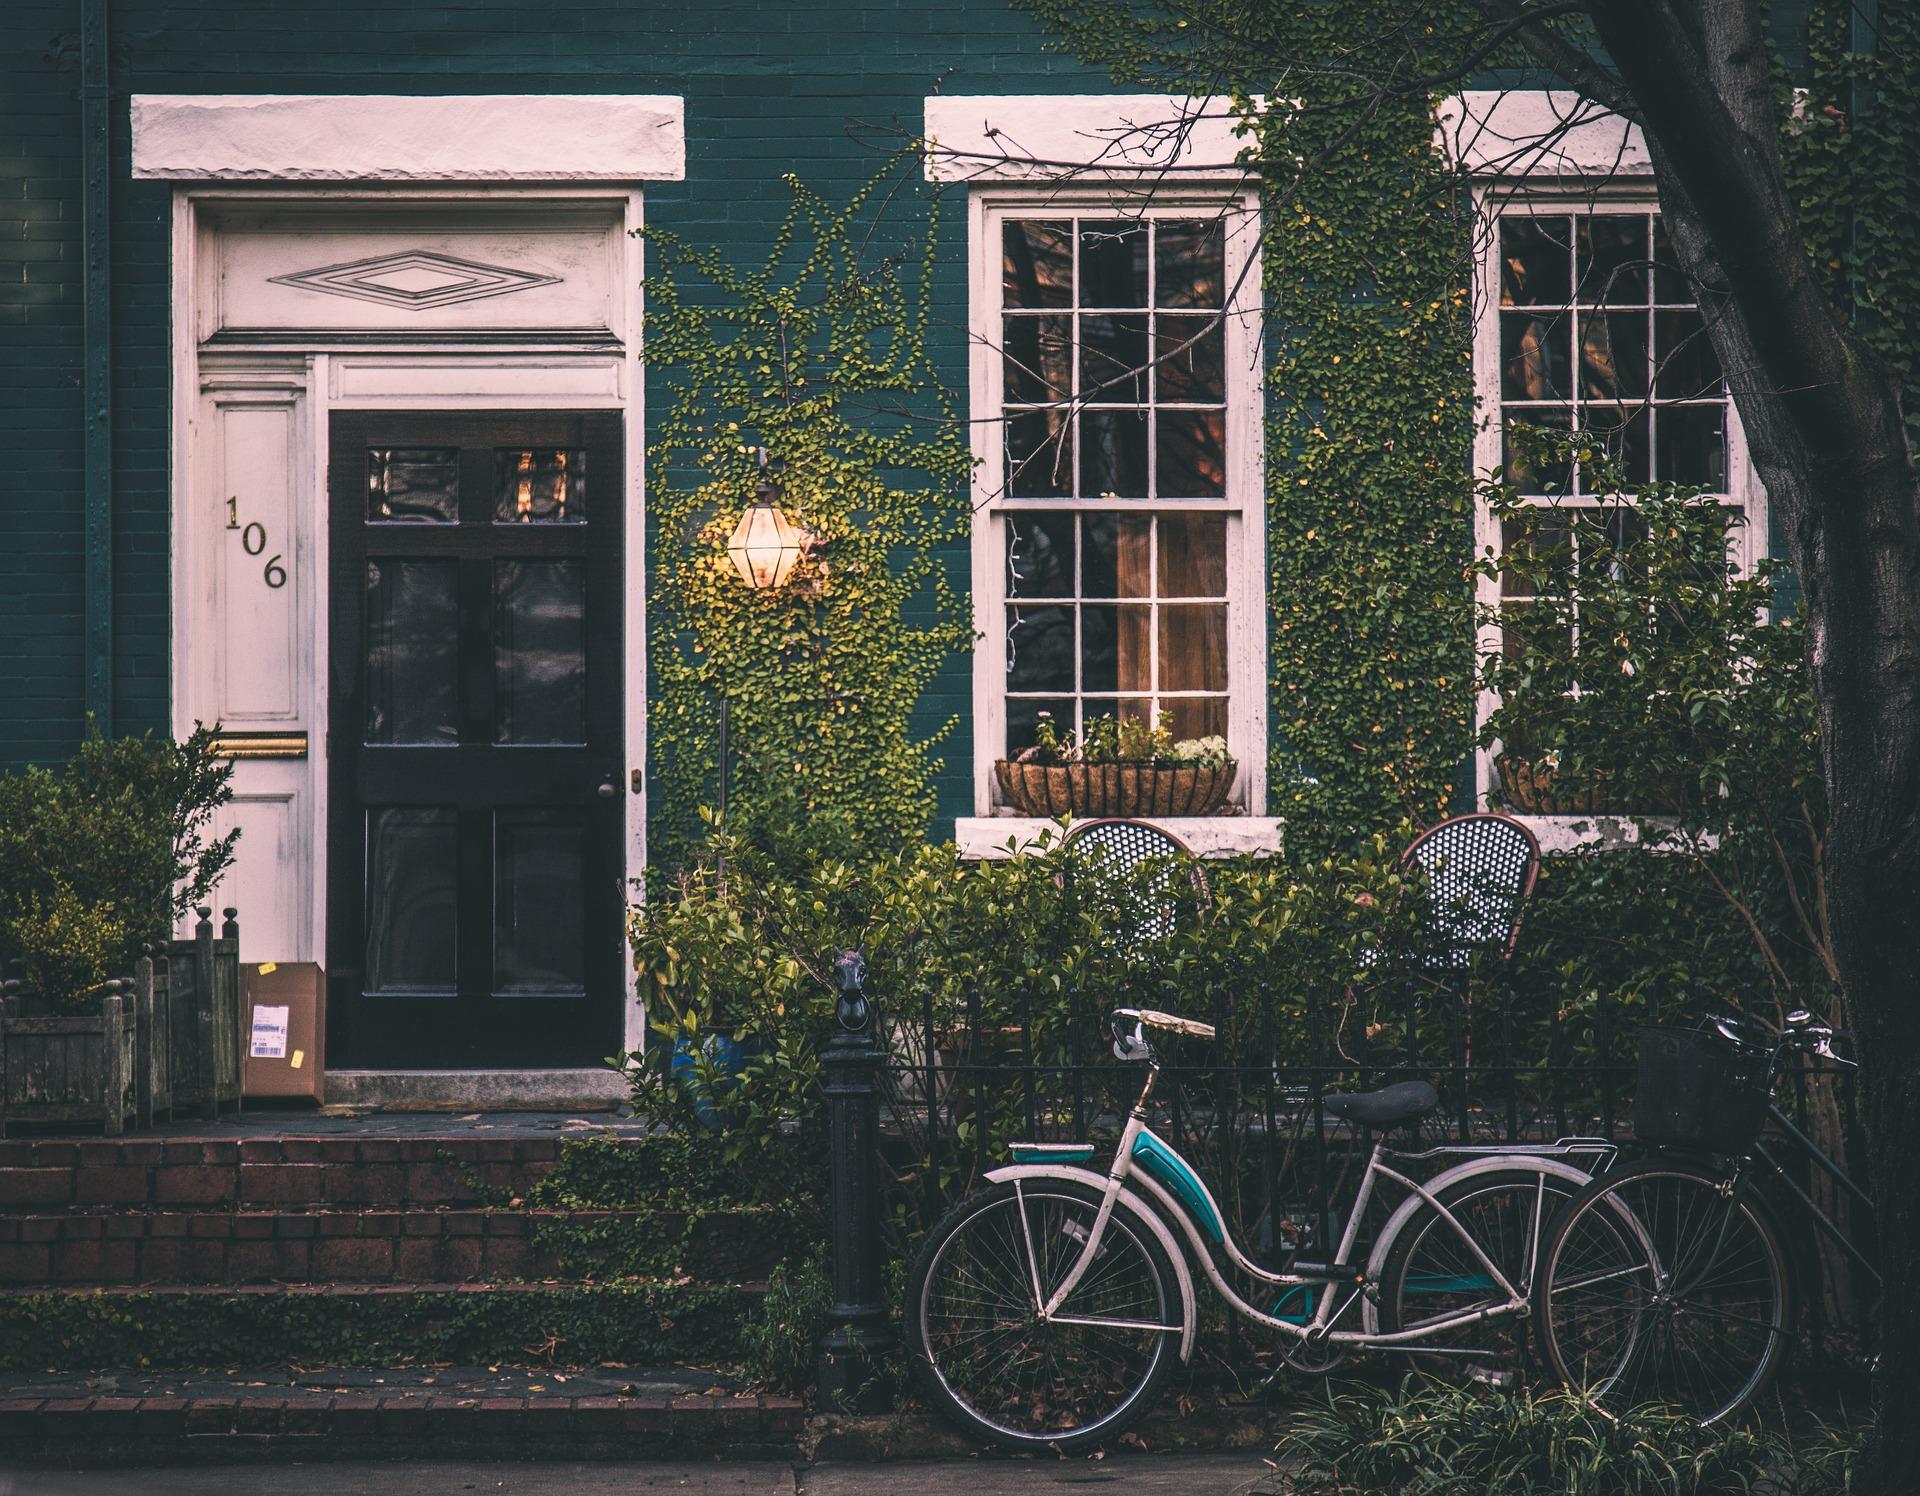 Hoe Richt Je Je Kleine Huis In?